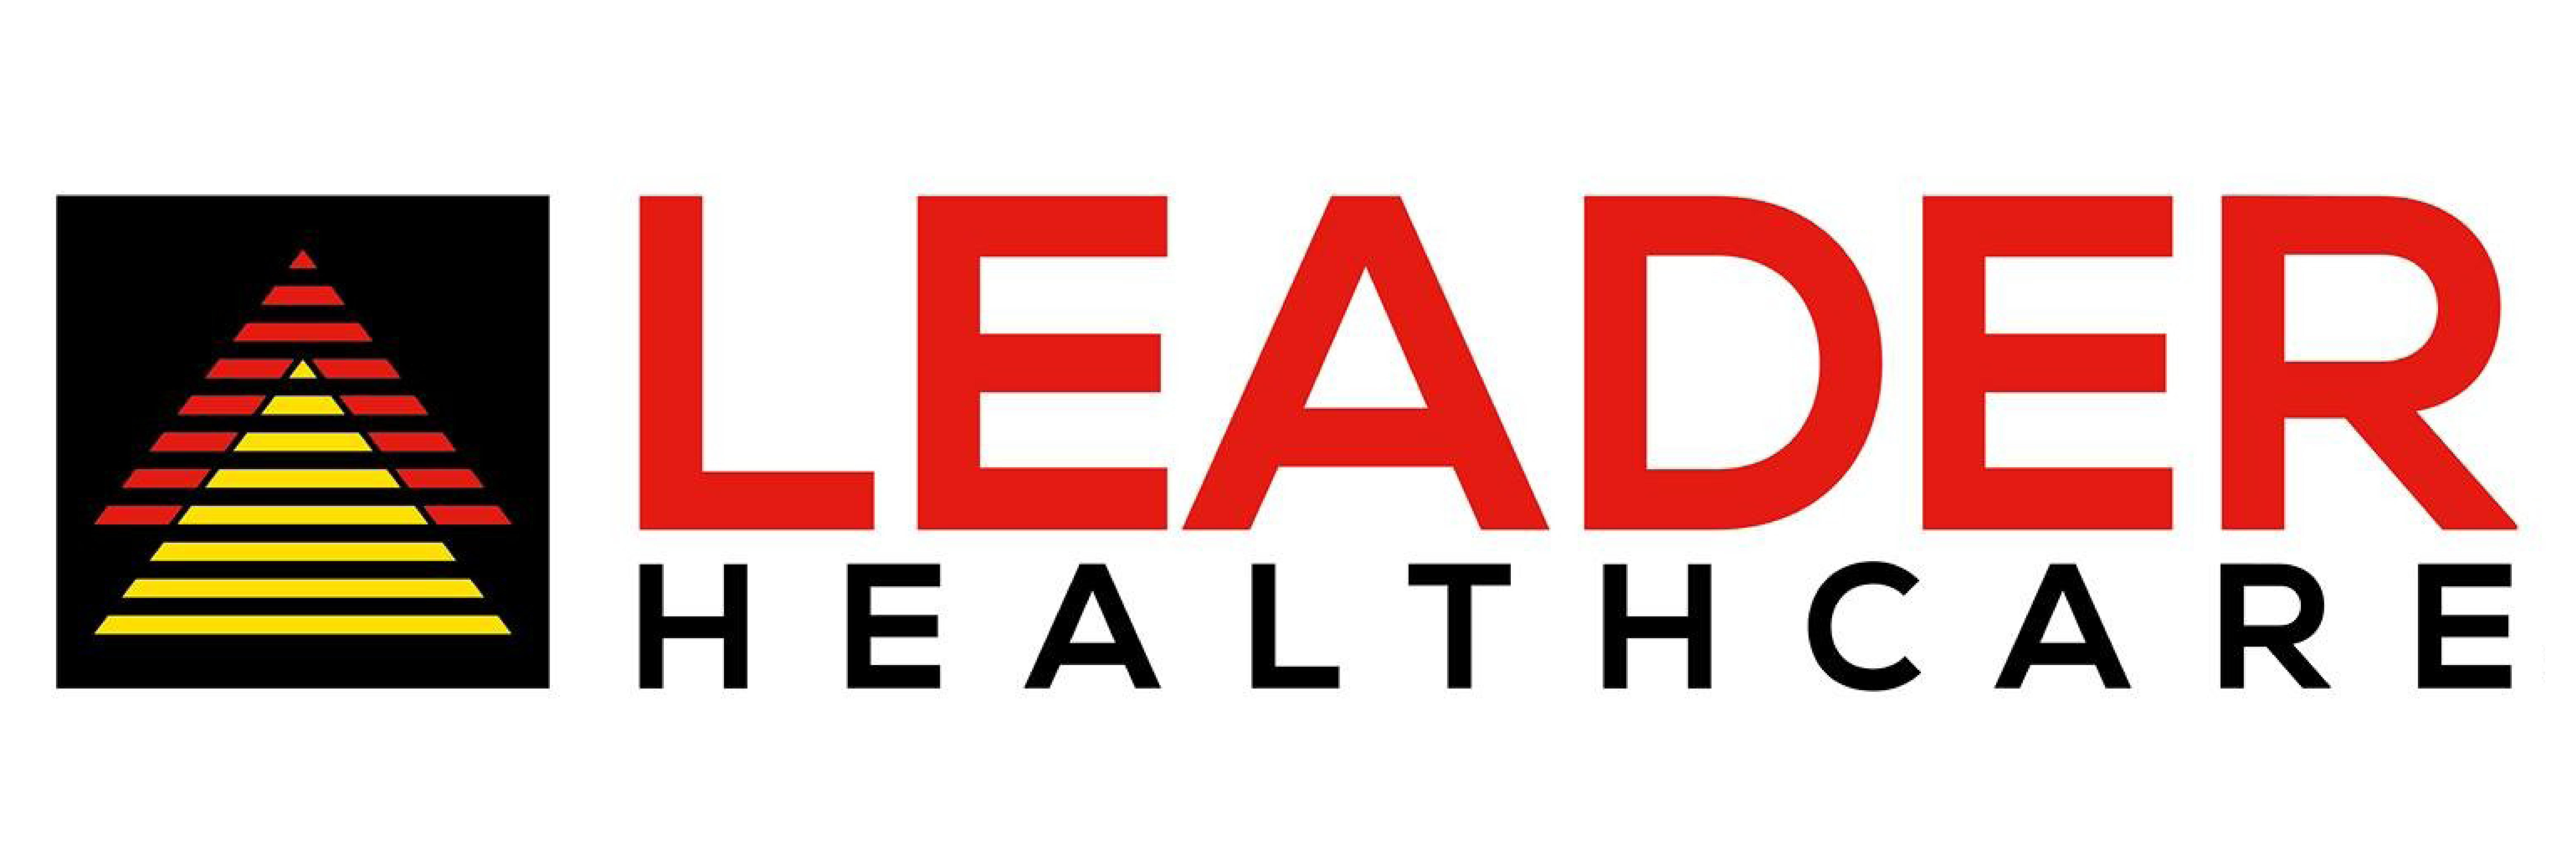 traumasim-leader-healthcare-hr.png